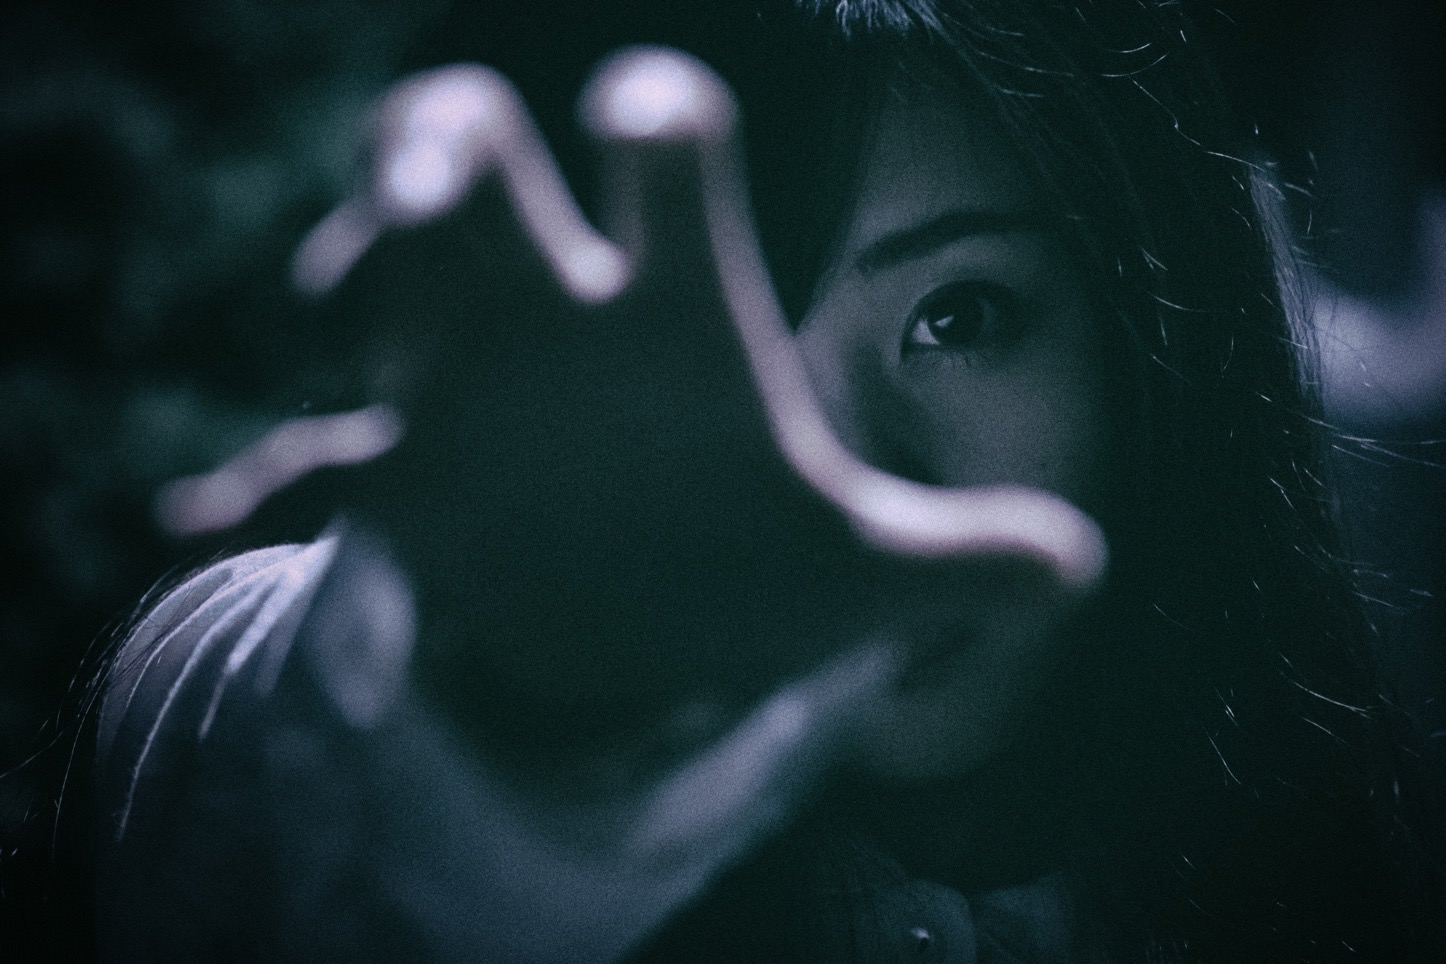 Pakutaso-Horror-Free-Stock-Photos-27.jpg